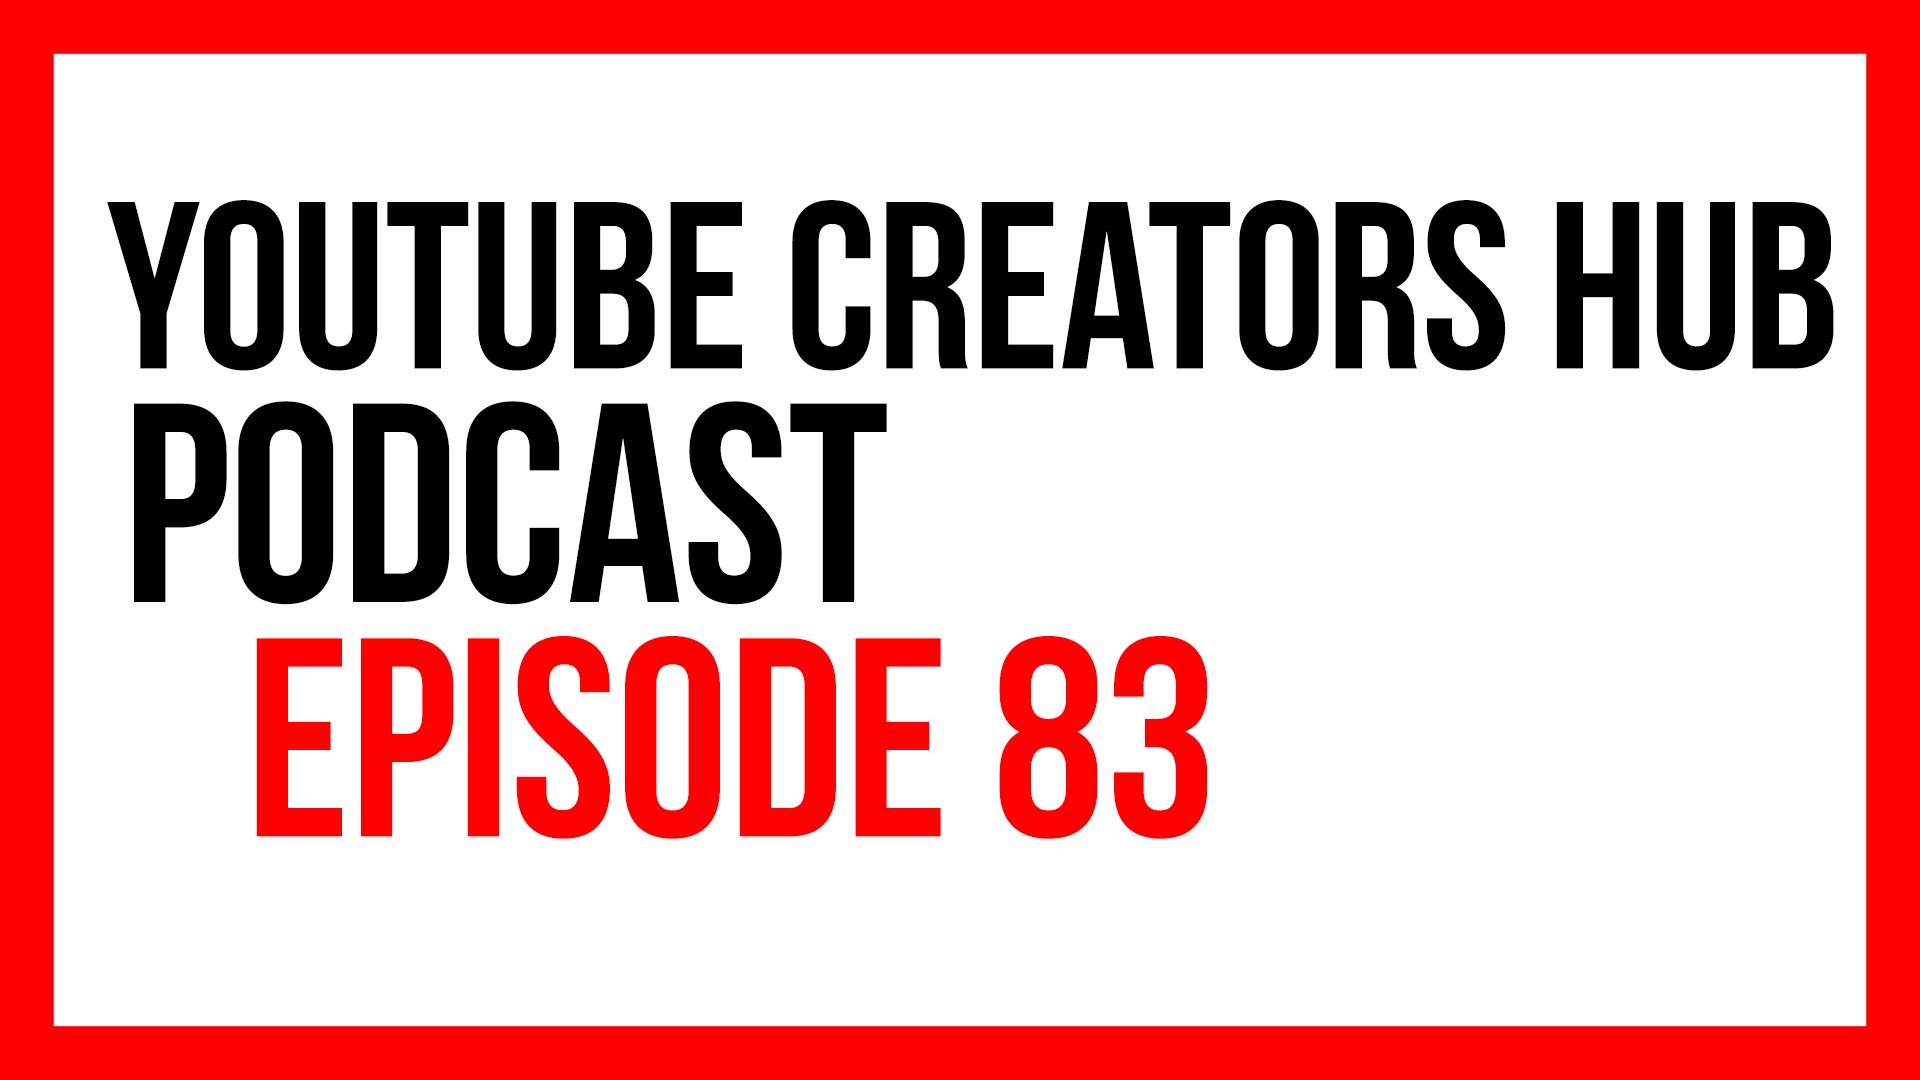 YouTube Creators Hub Podcast Episode 83